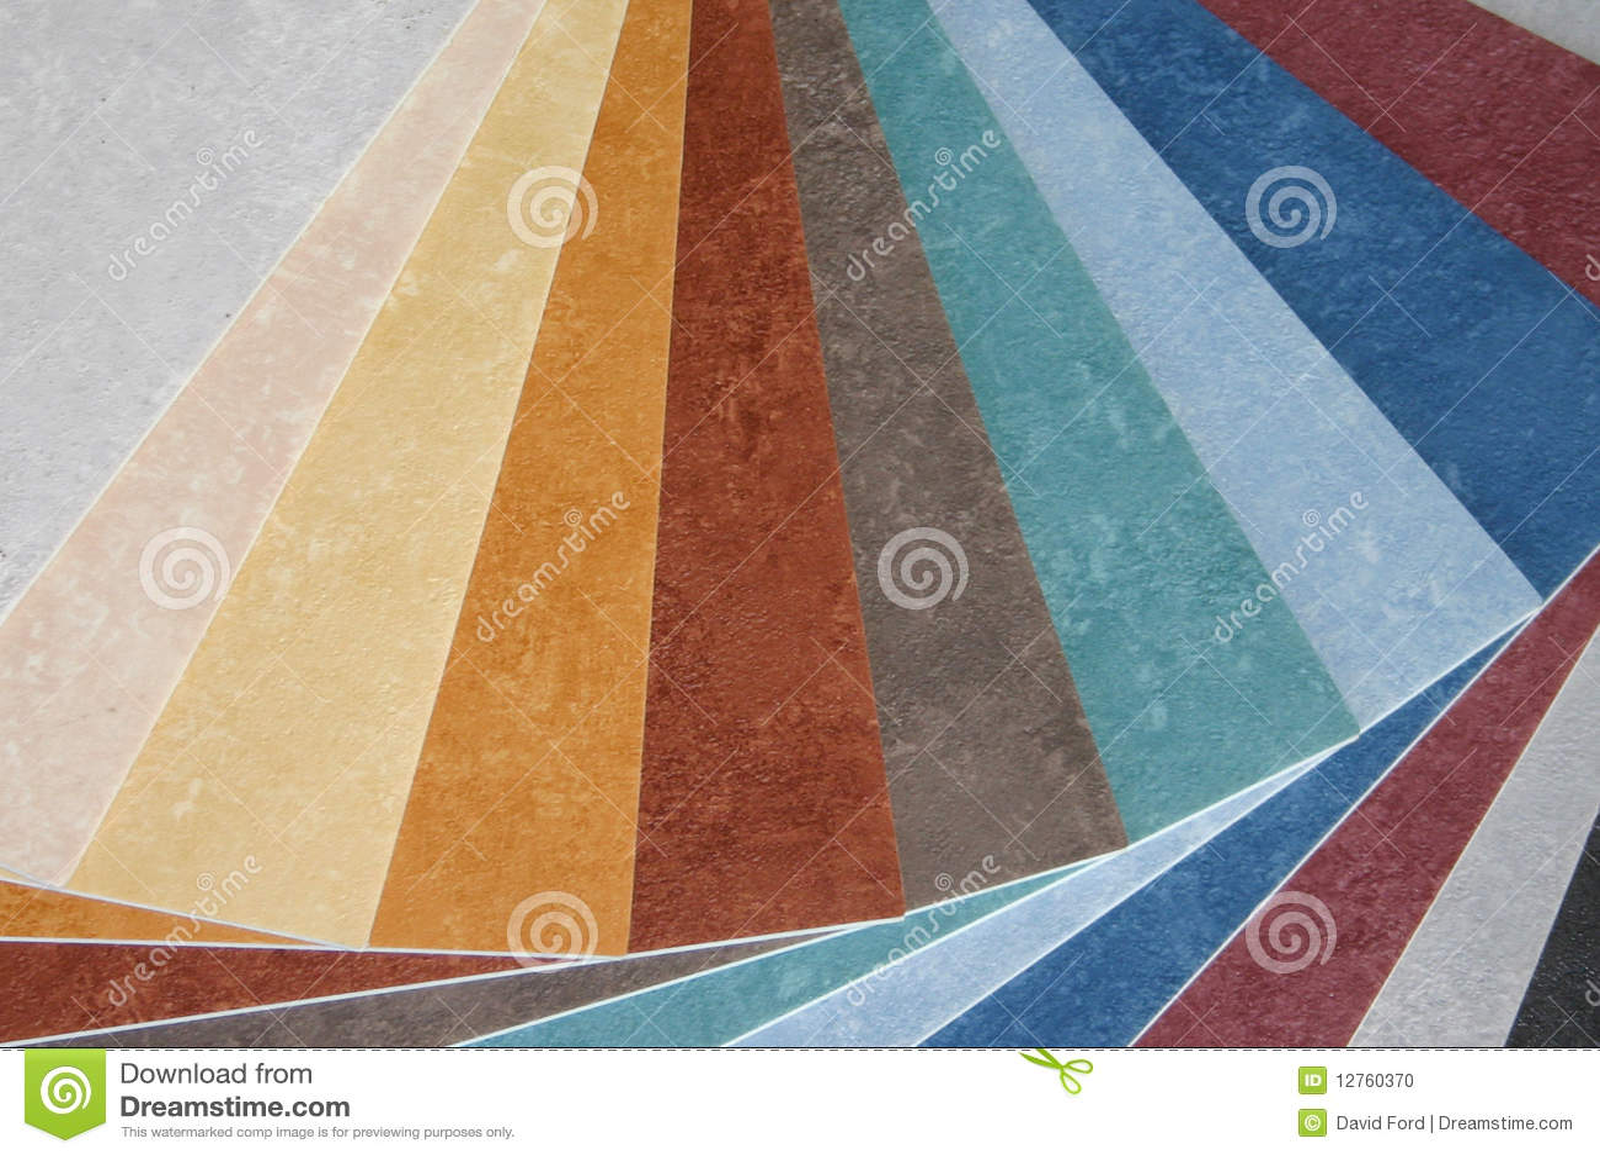 kitchen vinyl flooring cart 地板乙烯基库存照片 图片包括有目录 显示 内部 范例 地板 厨房 上色显示纹理乙烯基的陈列品选择